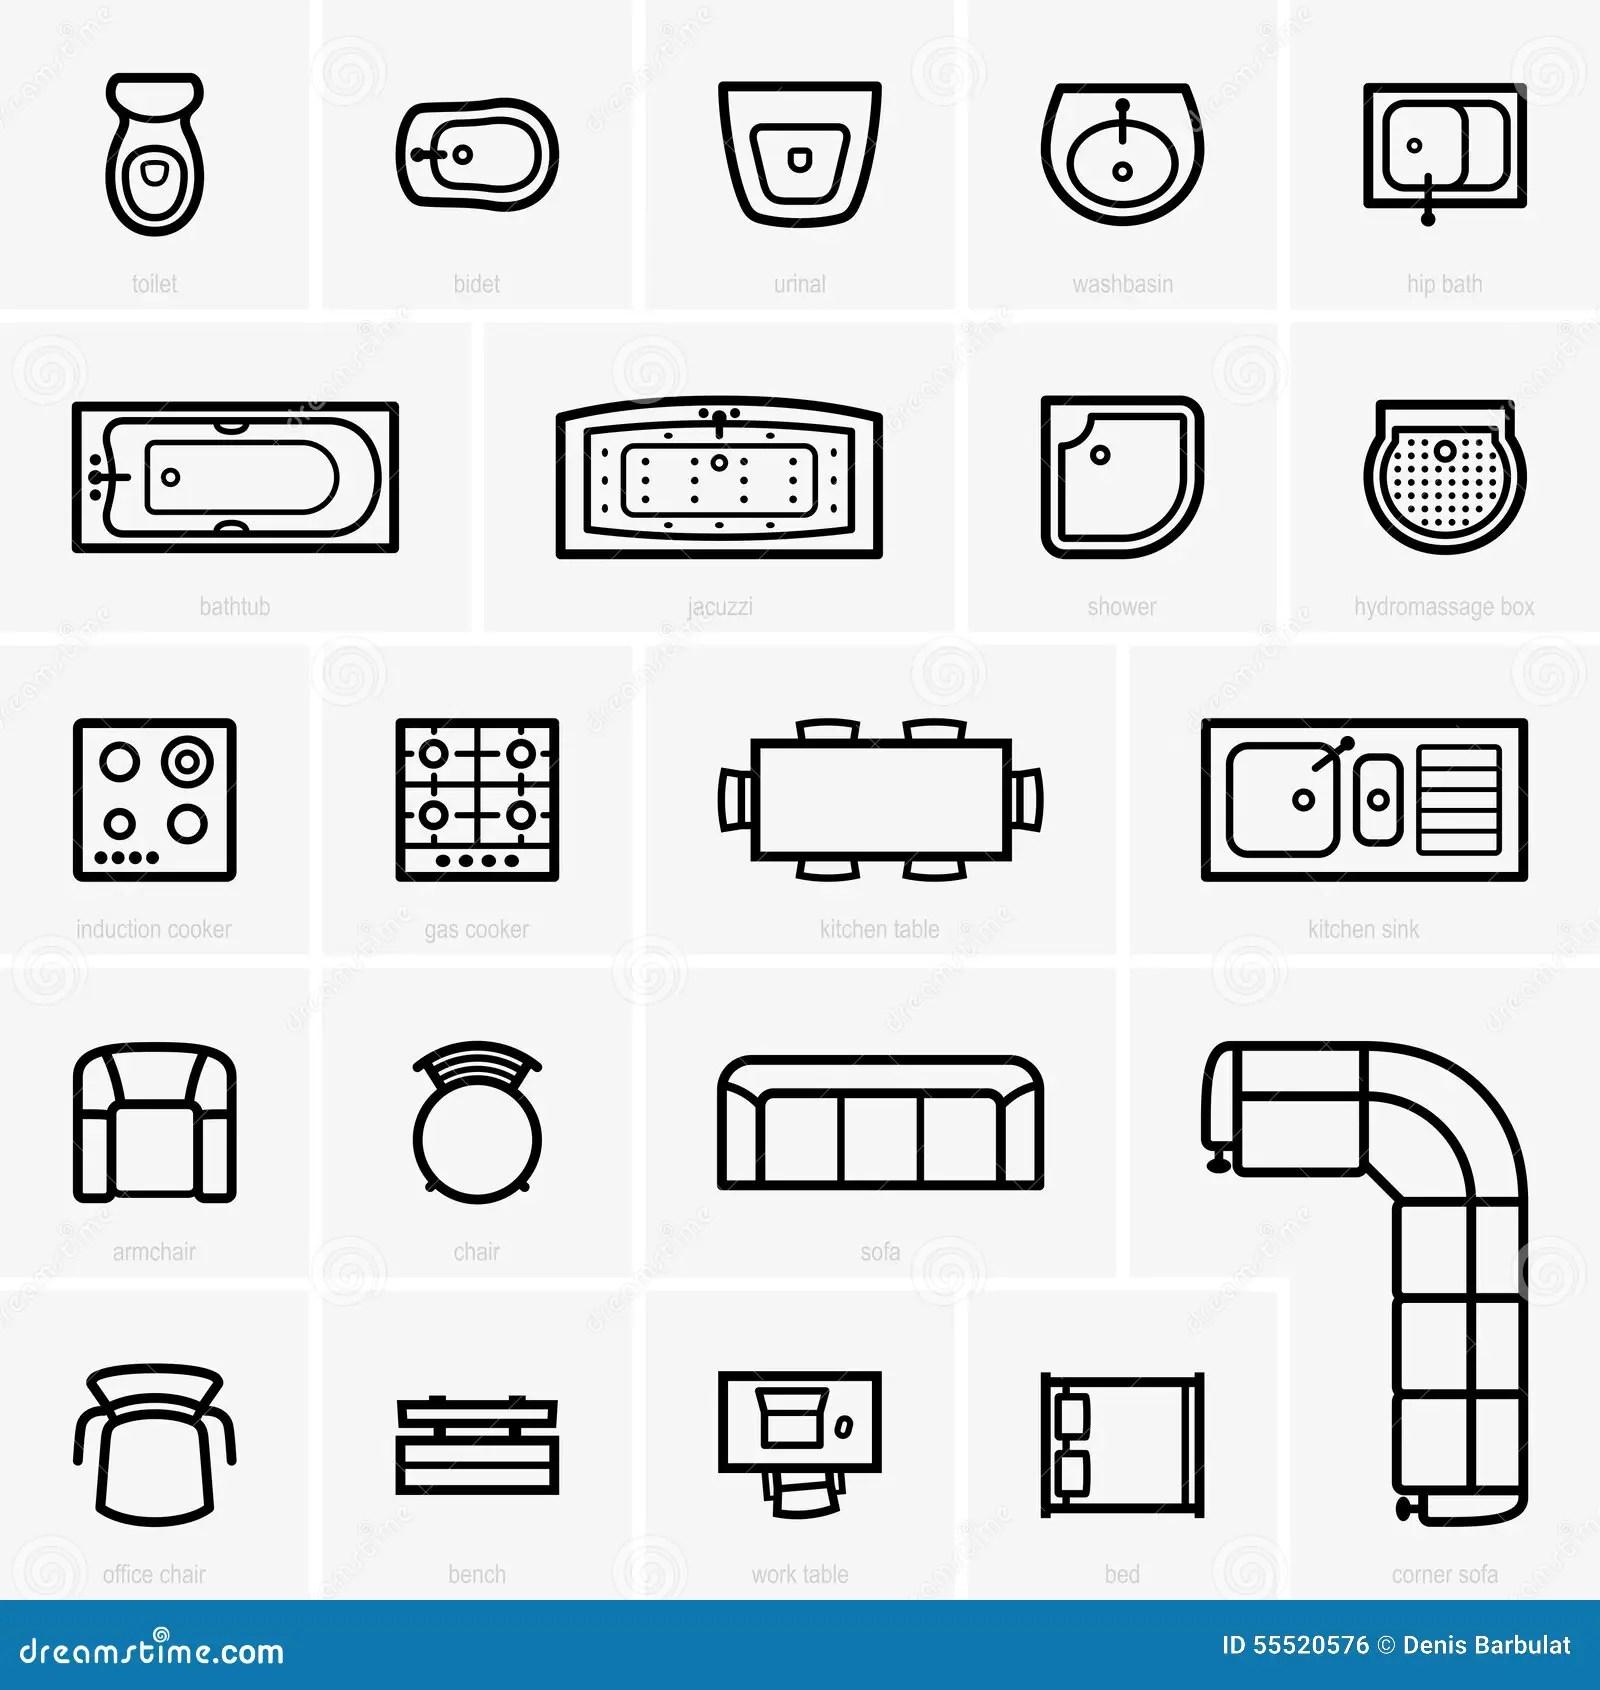 Icones Da Mobilia Da Vista Superior Ilustracao Do Vetor